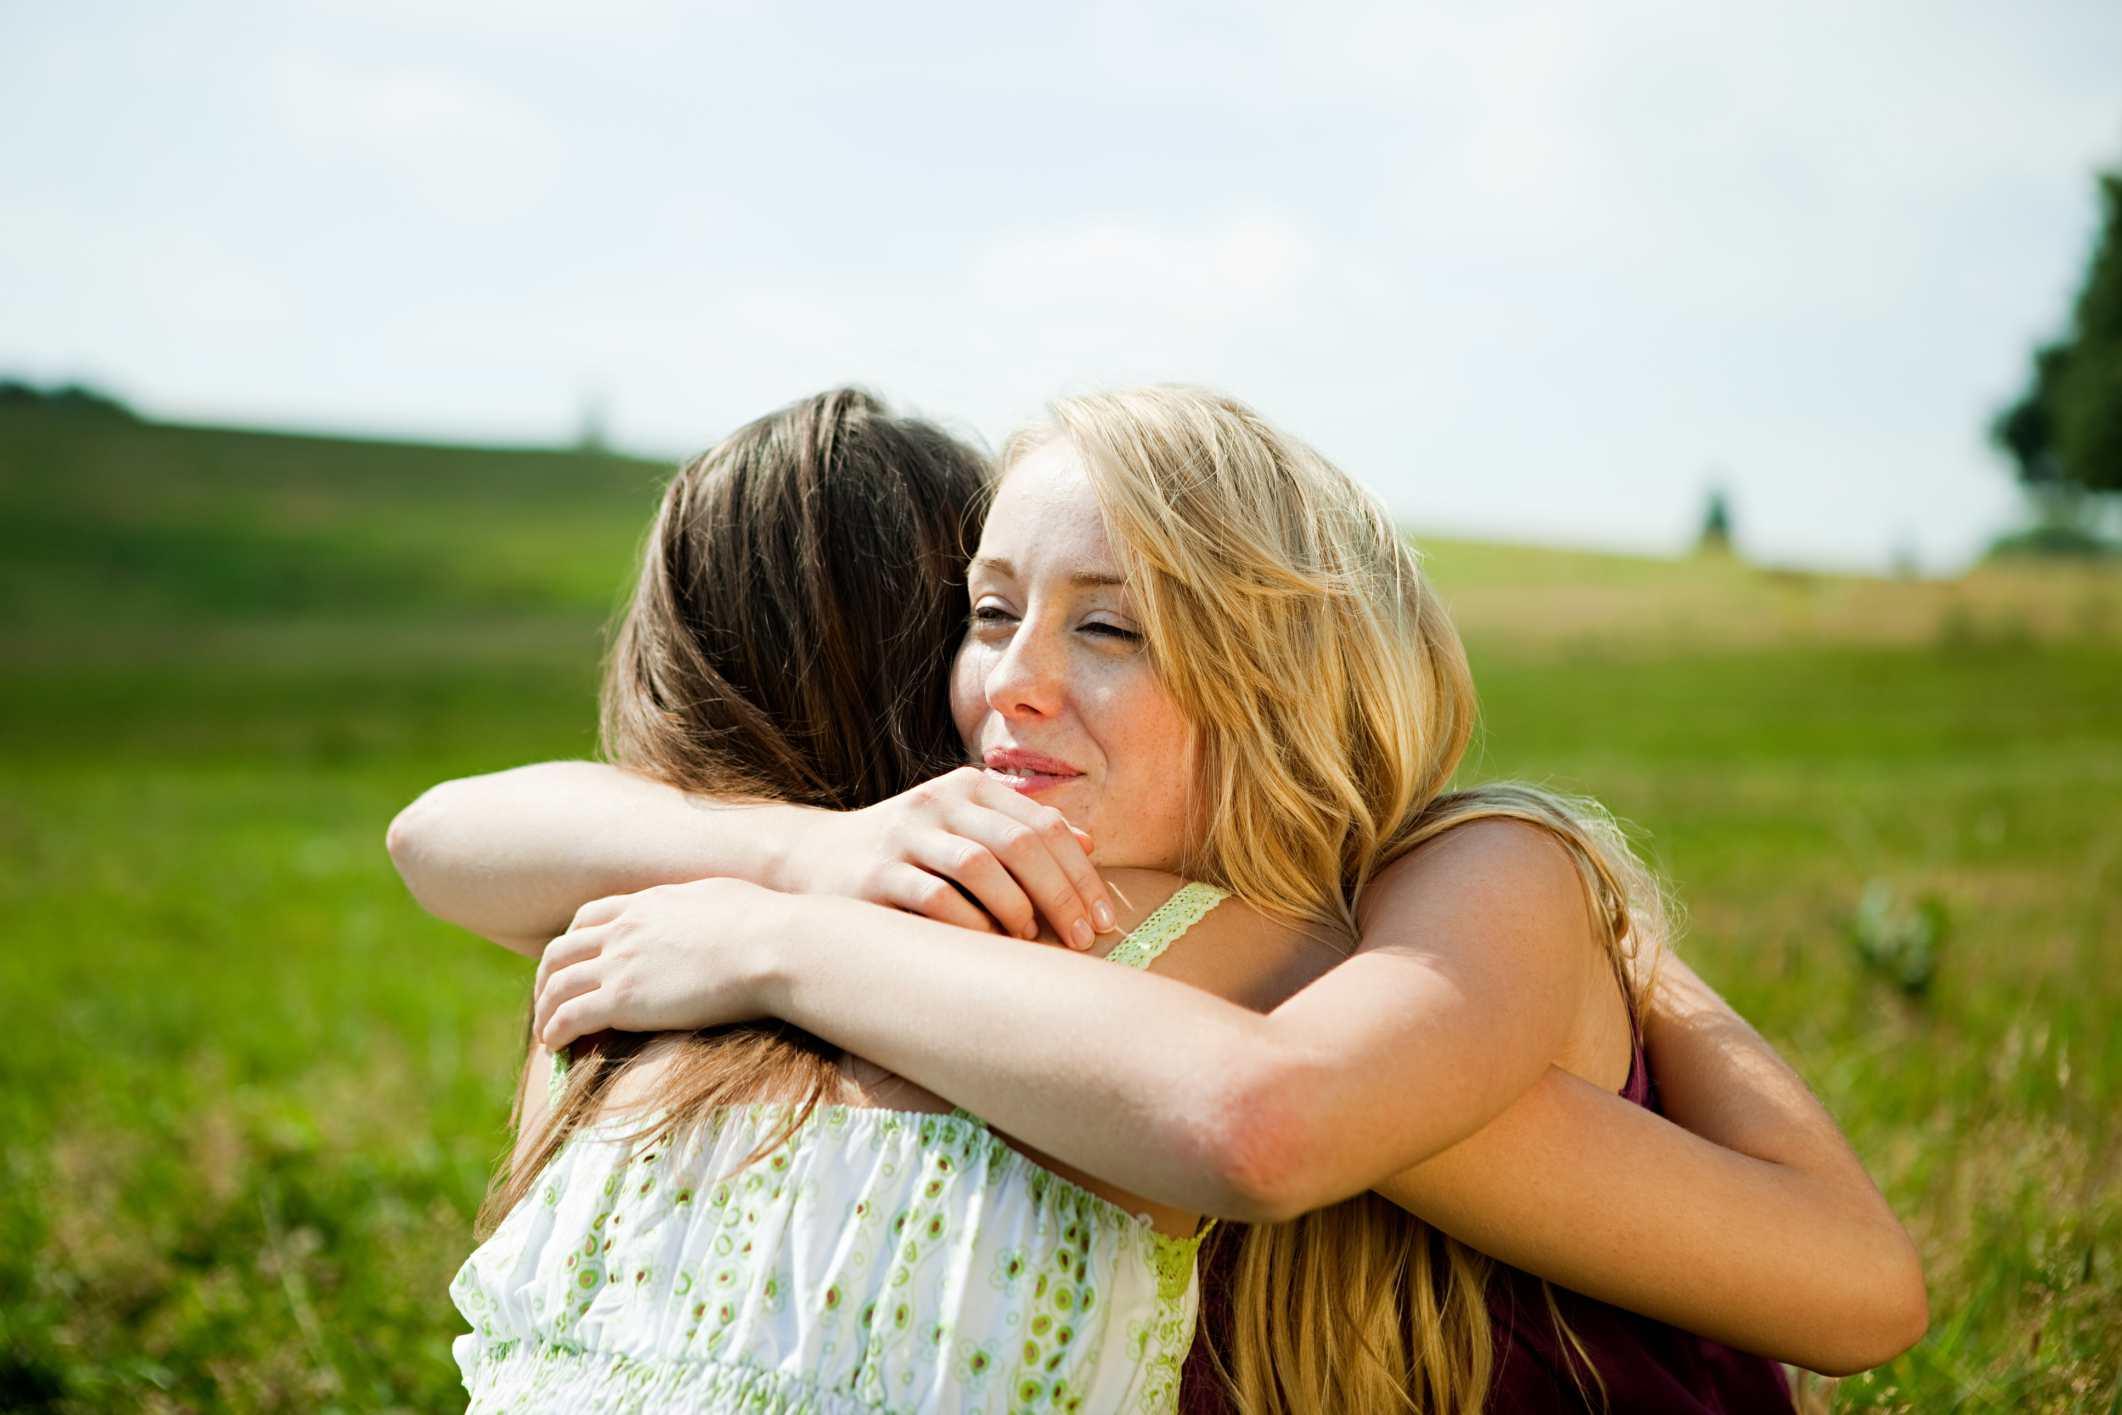 hug-friend-social-support-Image-Source.jpg